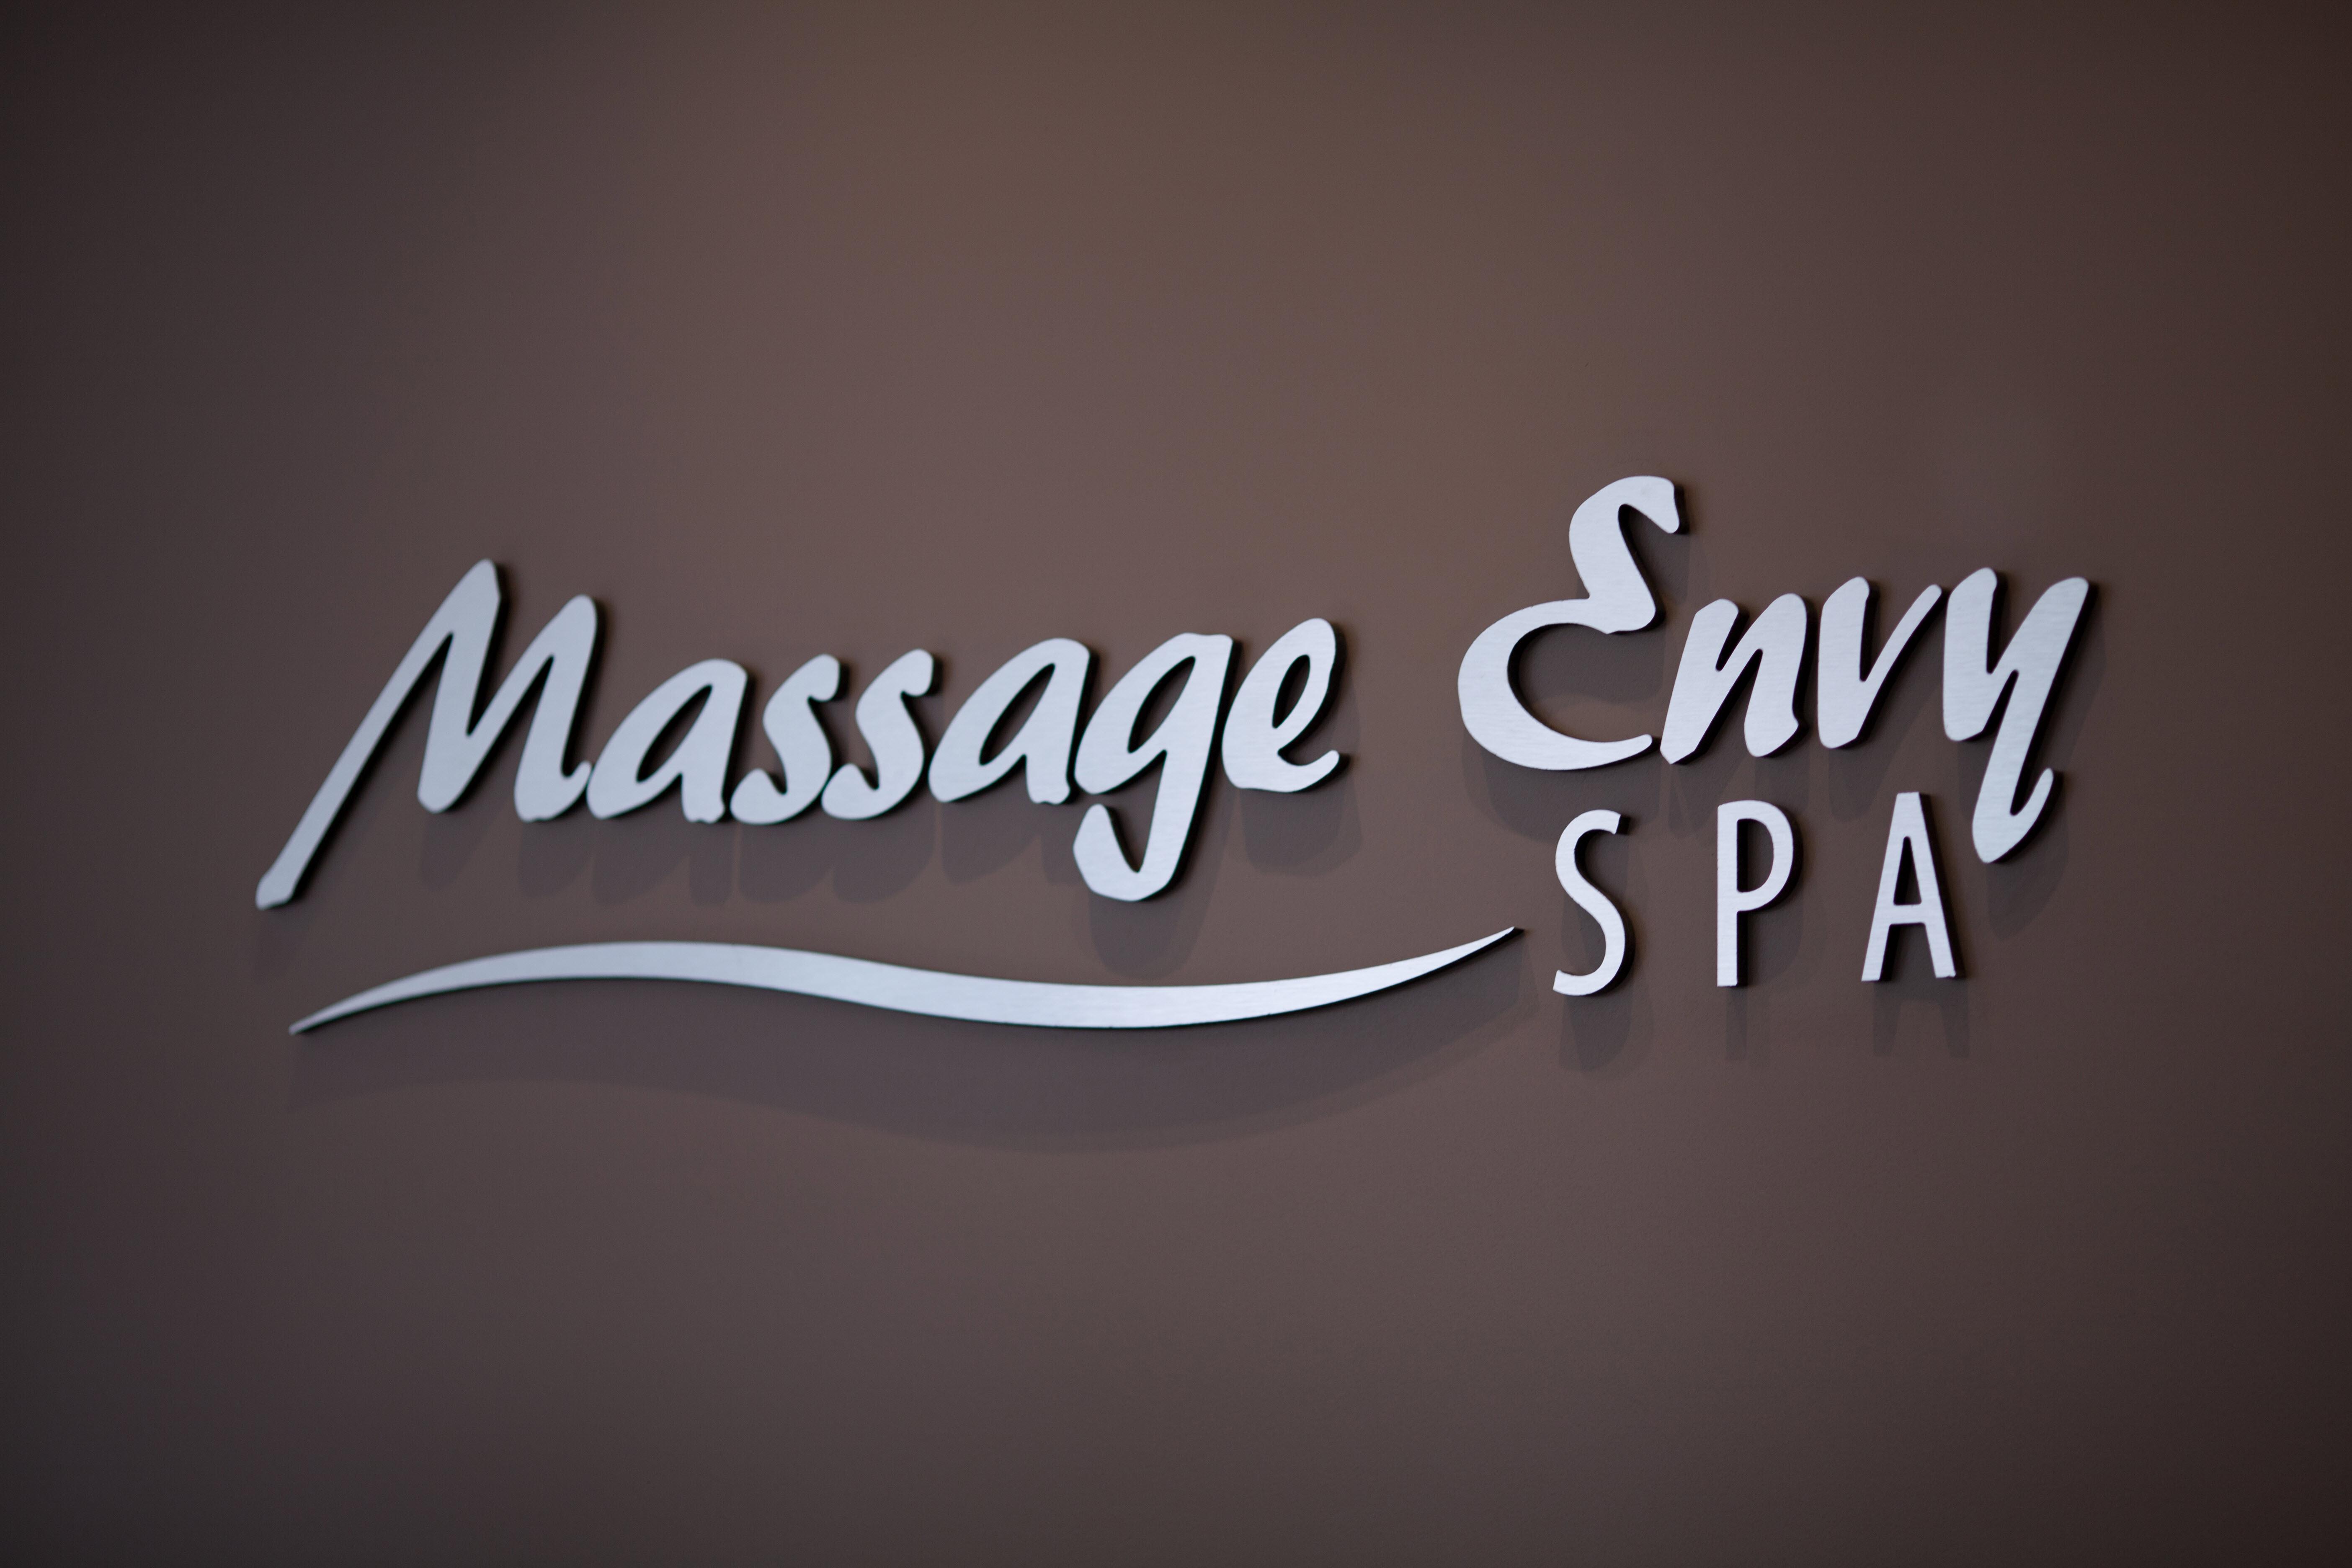 Massage Envy Spa - Brownsburg